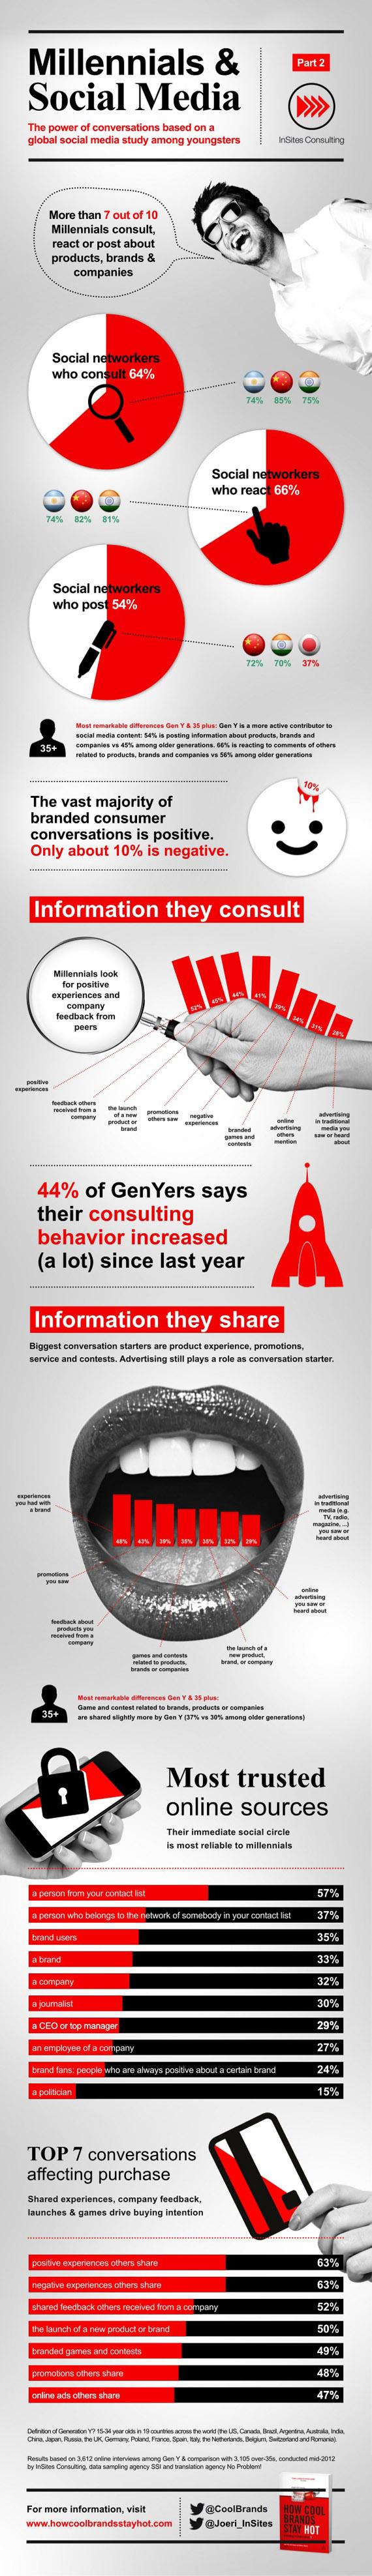 infographic insites millennials 2